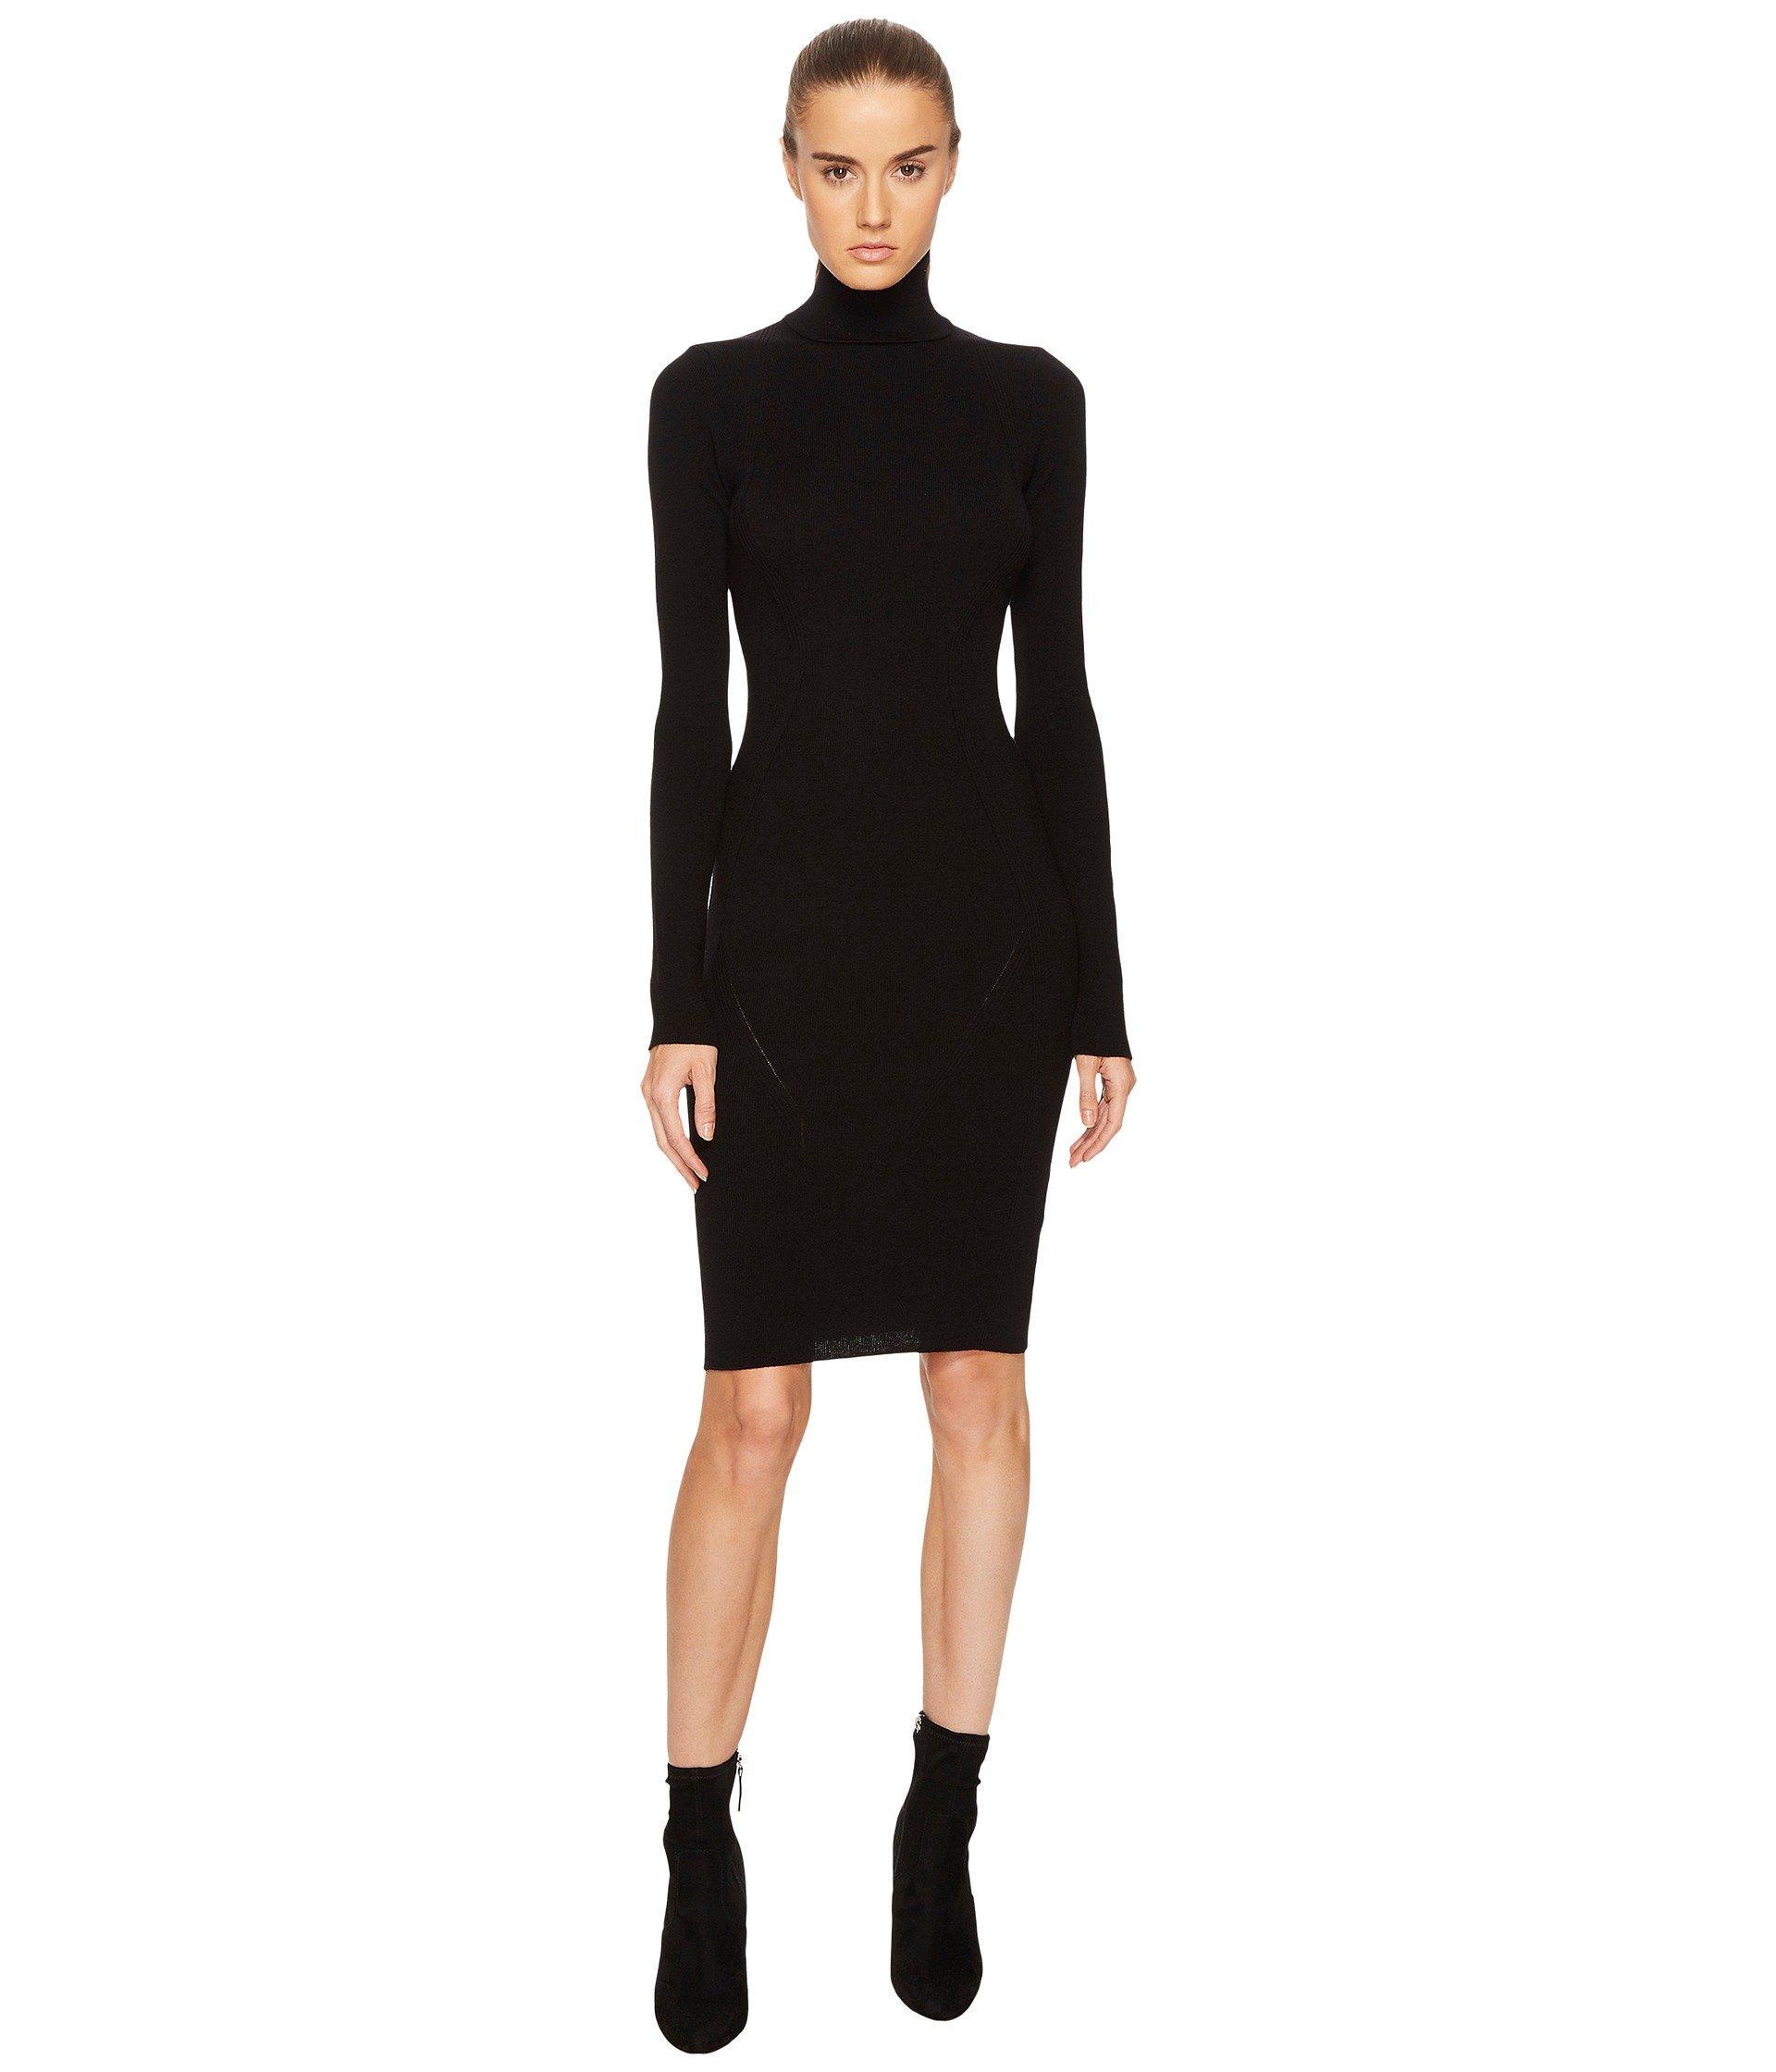 Dsquared2 Knit Turtleneck Long Sleeve Dress, Black